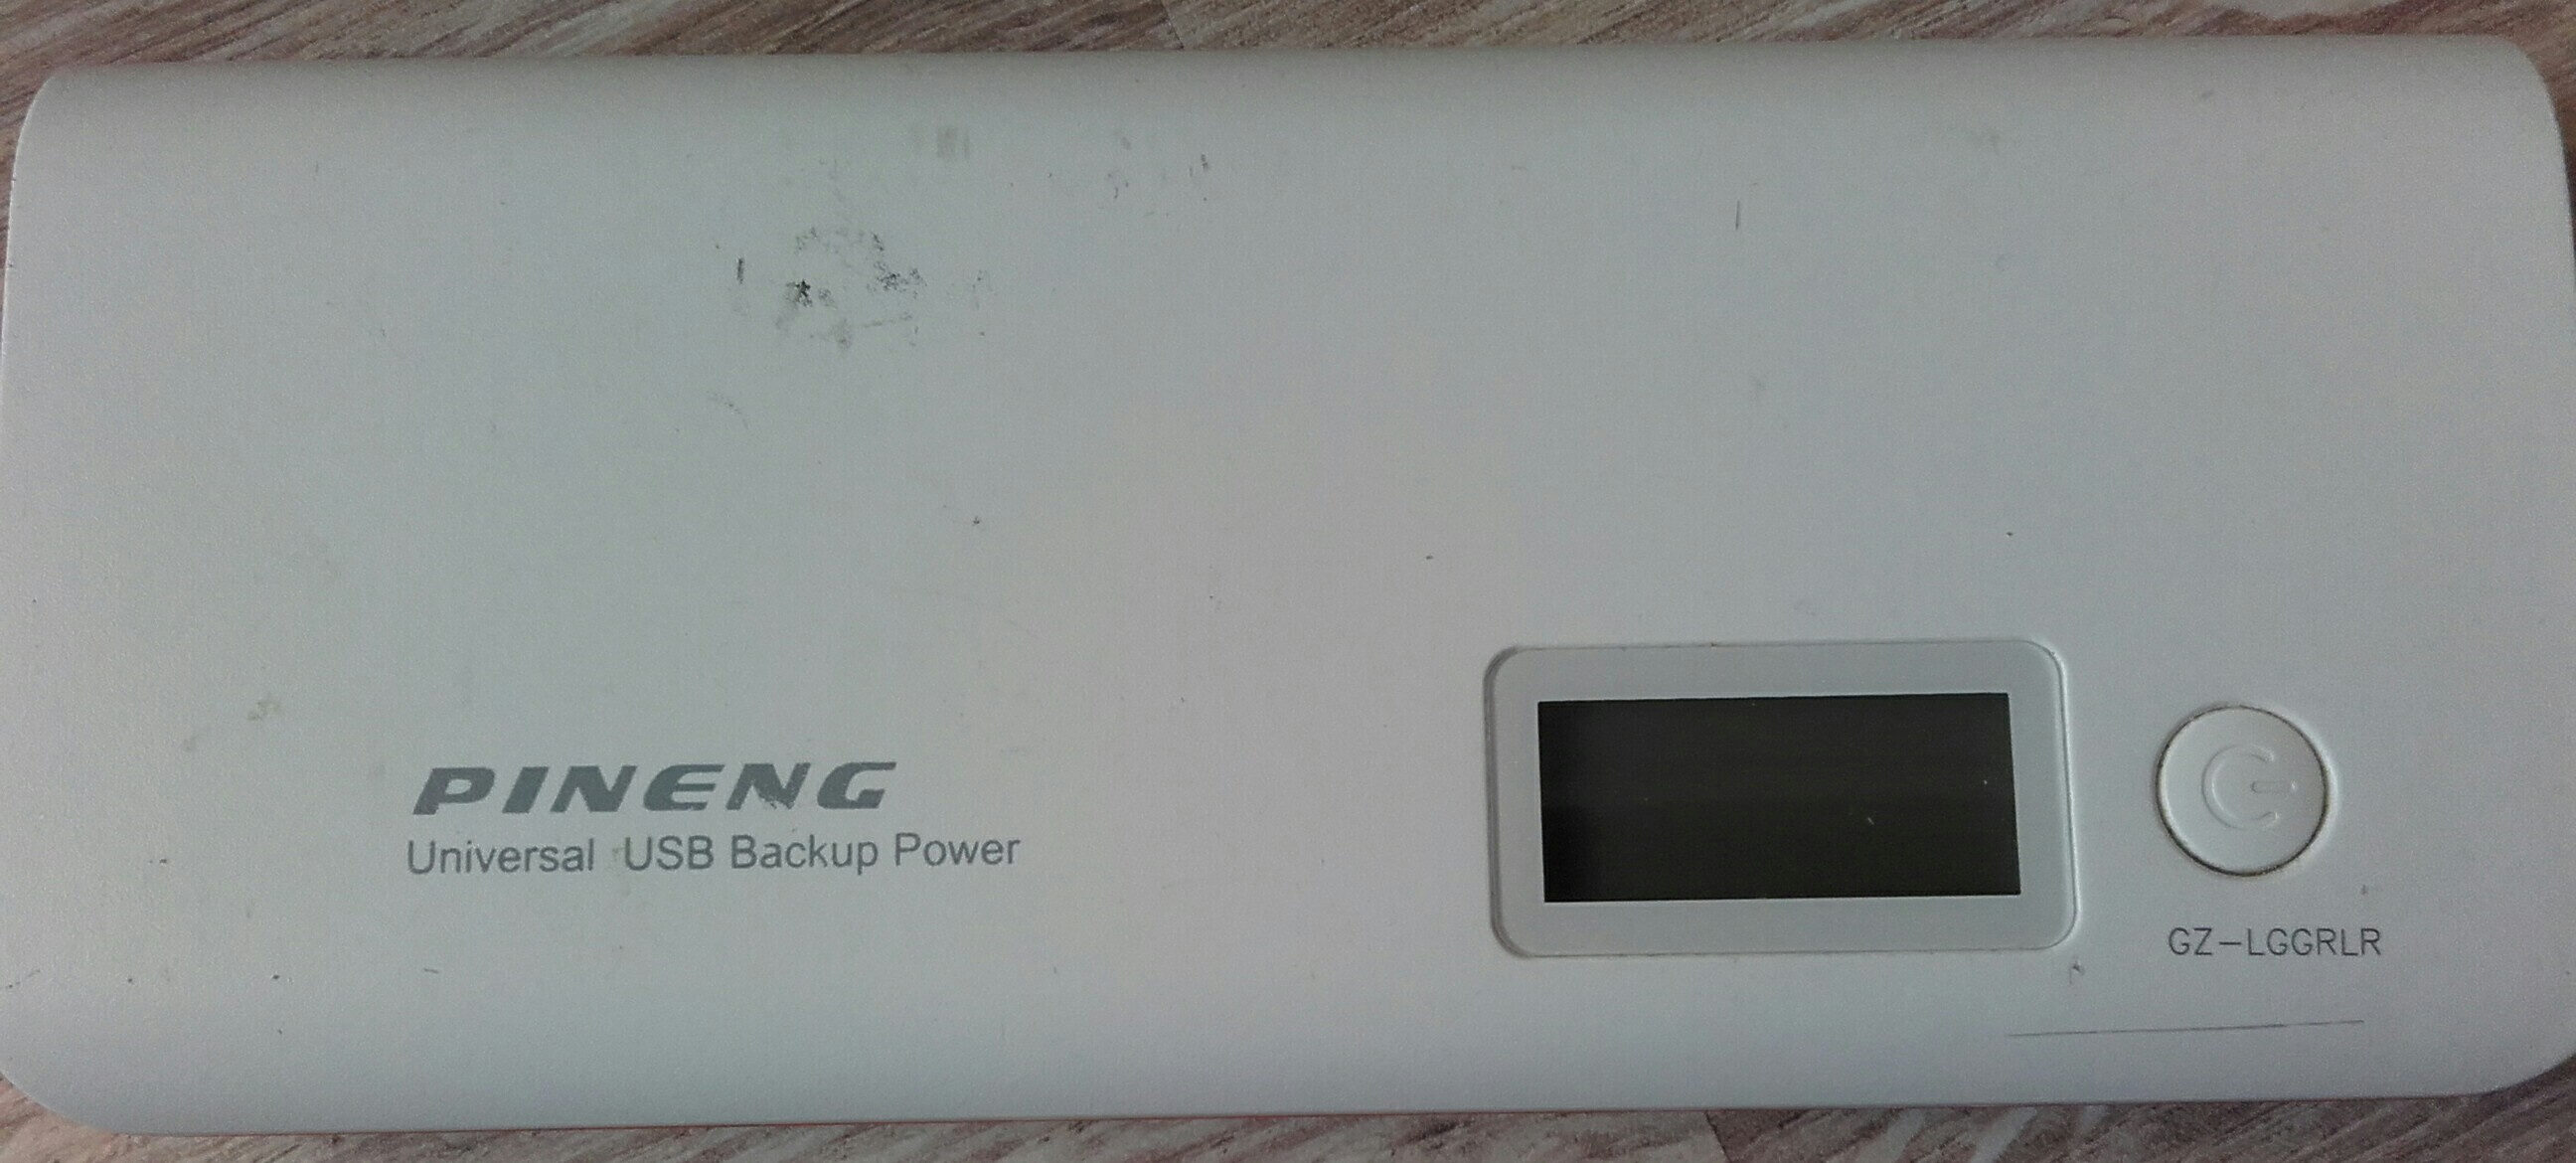 Universal USB Backup Power - Produit - en